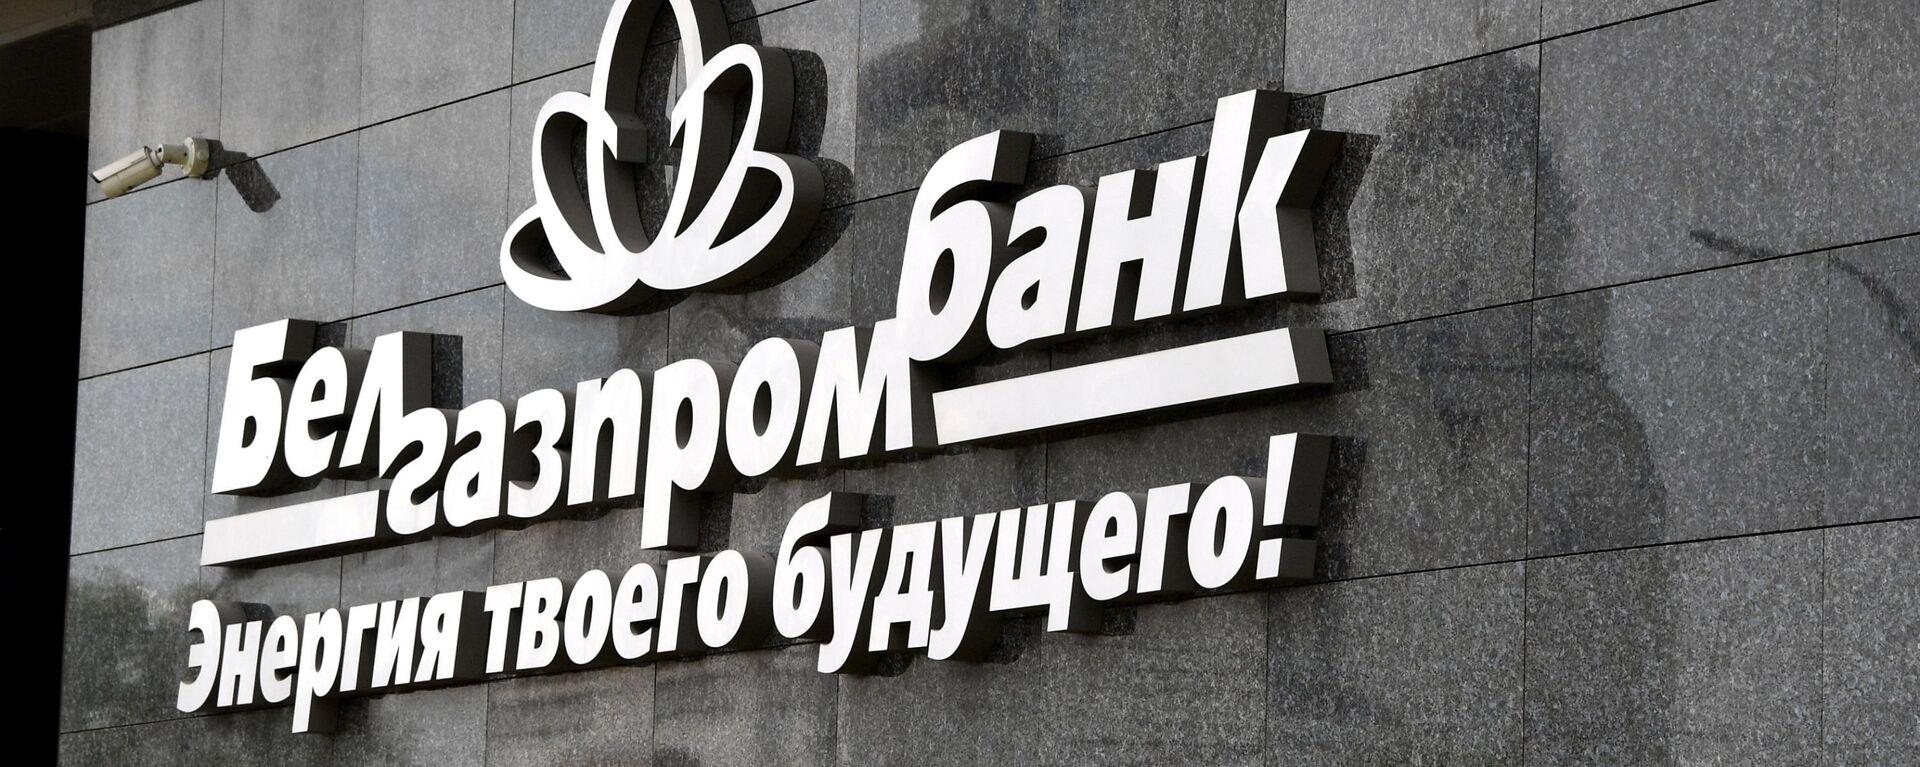 Здание Белгазпромбанка - Sputnik Беларусь, 1920, 12.10.2021